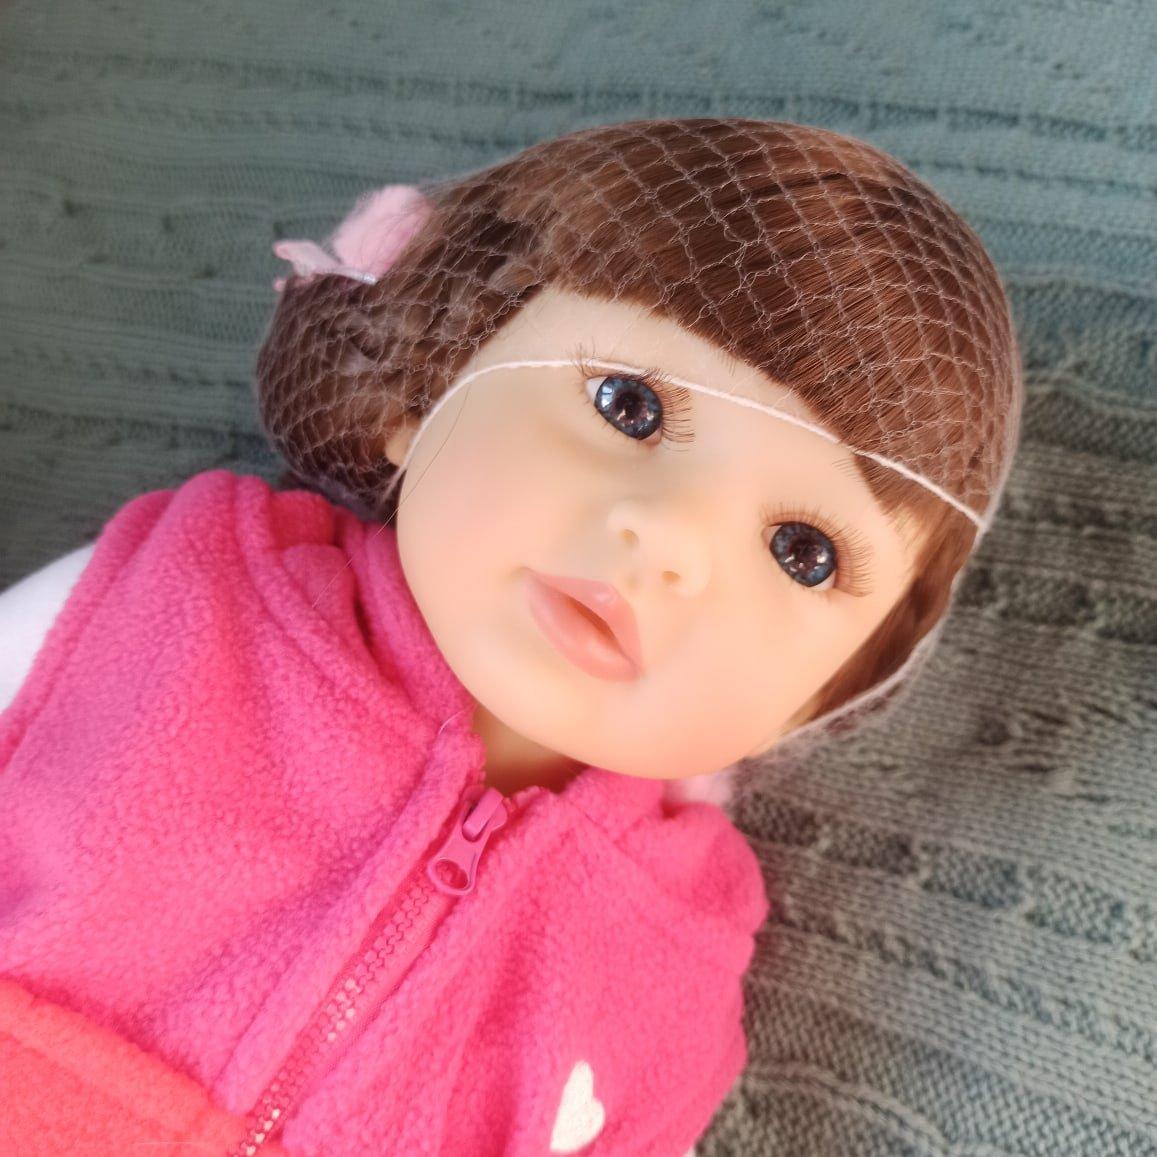 Красивая реалистичная кукла бренда NPK - цена